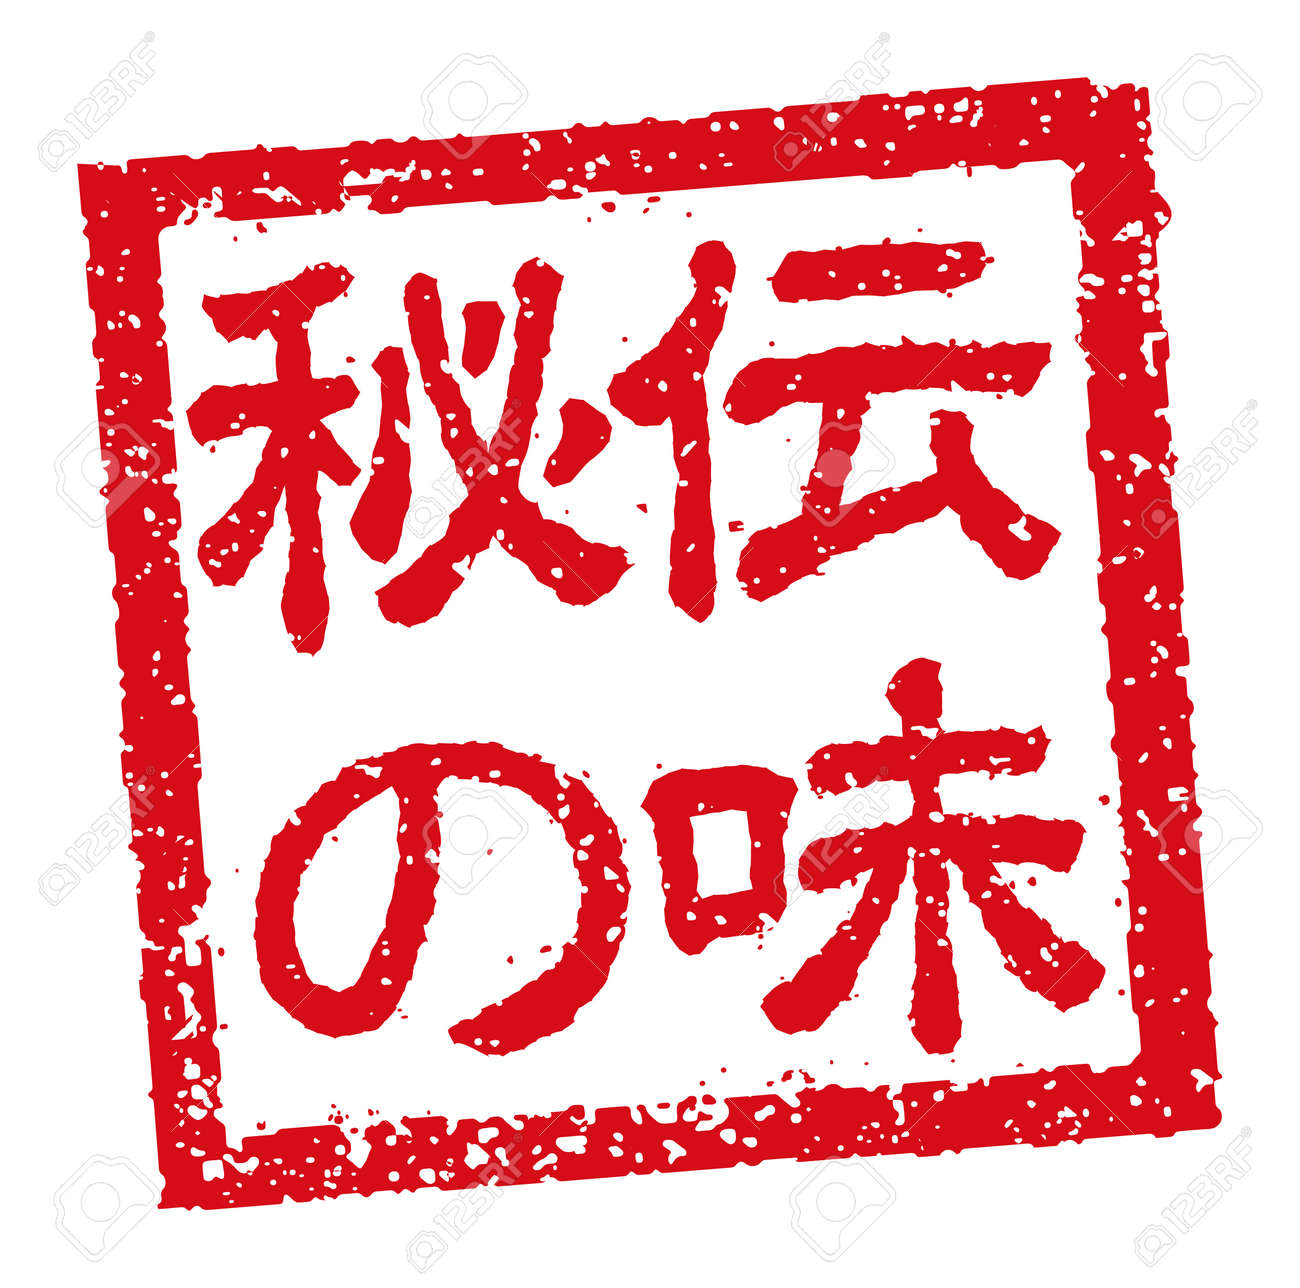 Rubber stamp illustration often used in Japanese restaurants and pubs | Secret recipe - 168884991